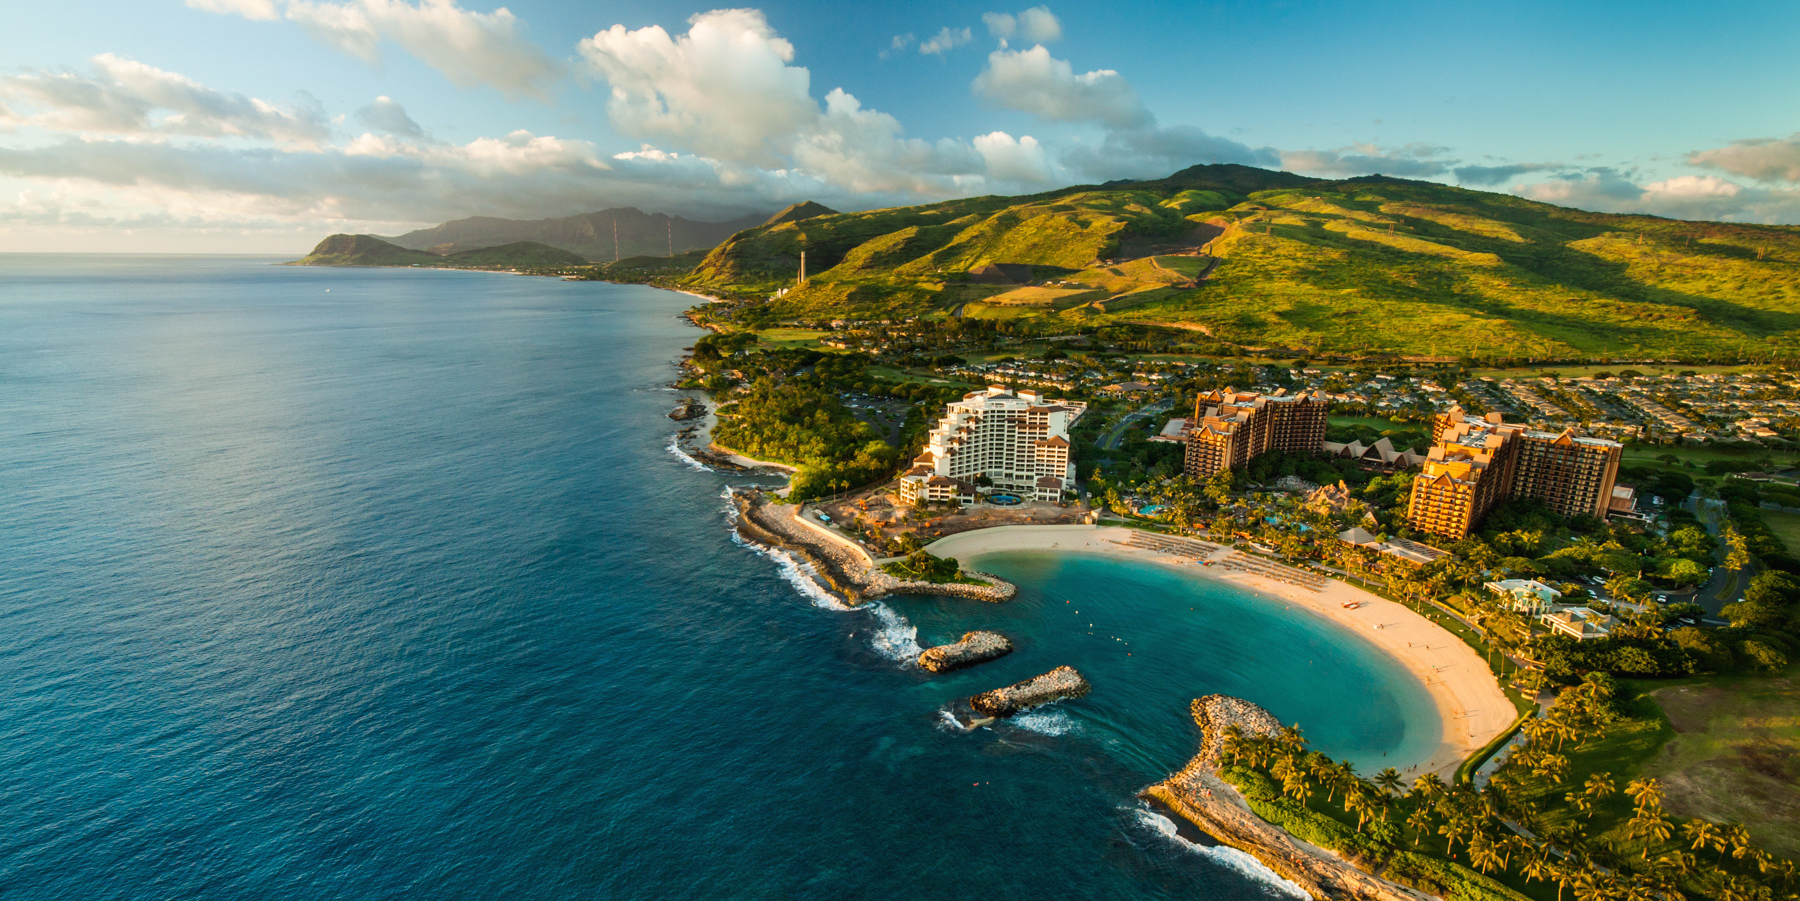 Ko-Olina-Resort-Aerial-Real-Estate-Vacation-Rentals-Munro-Murdock-cropped